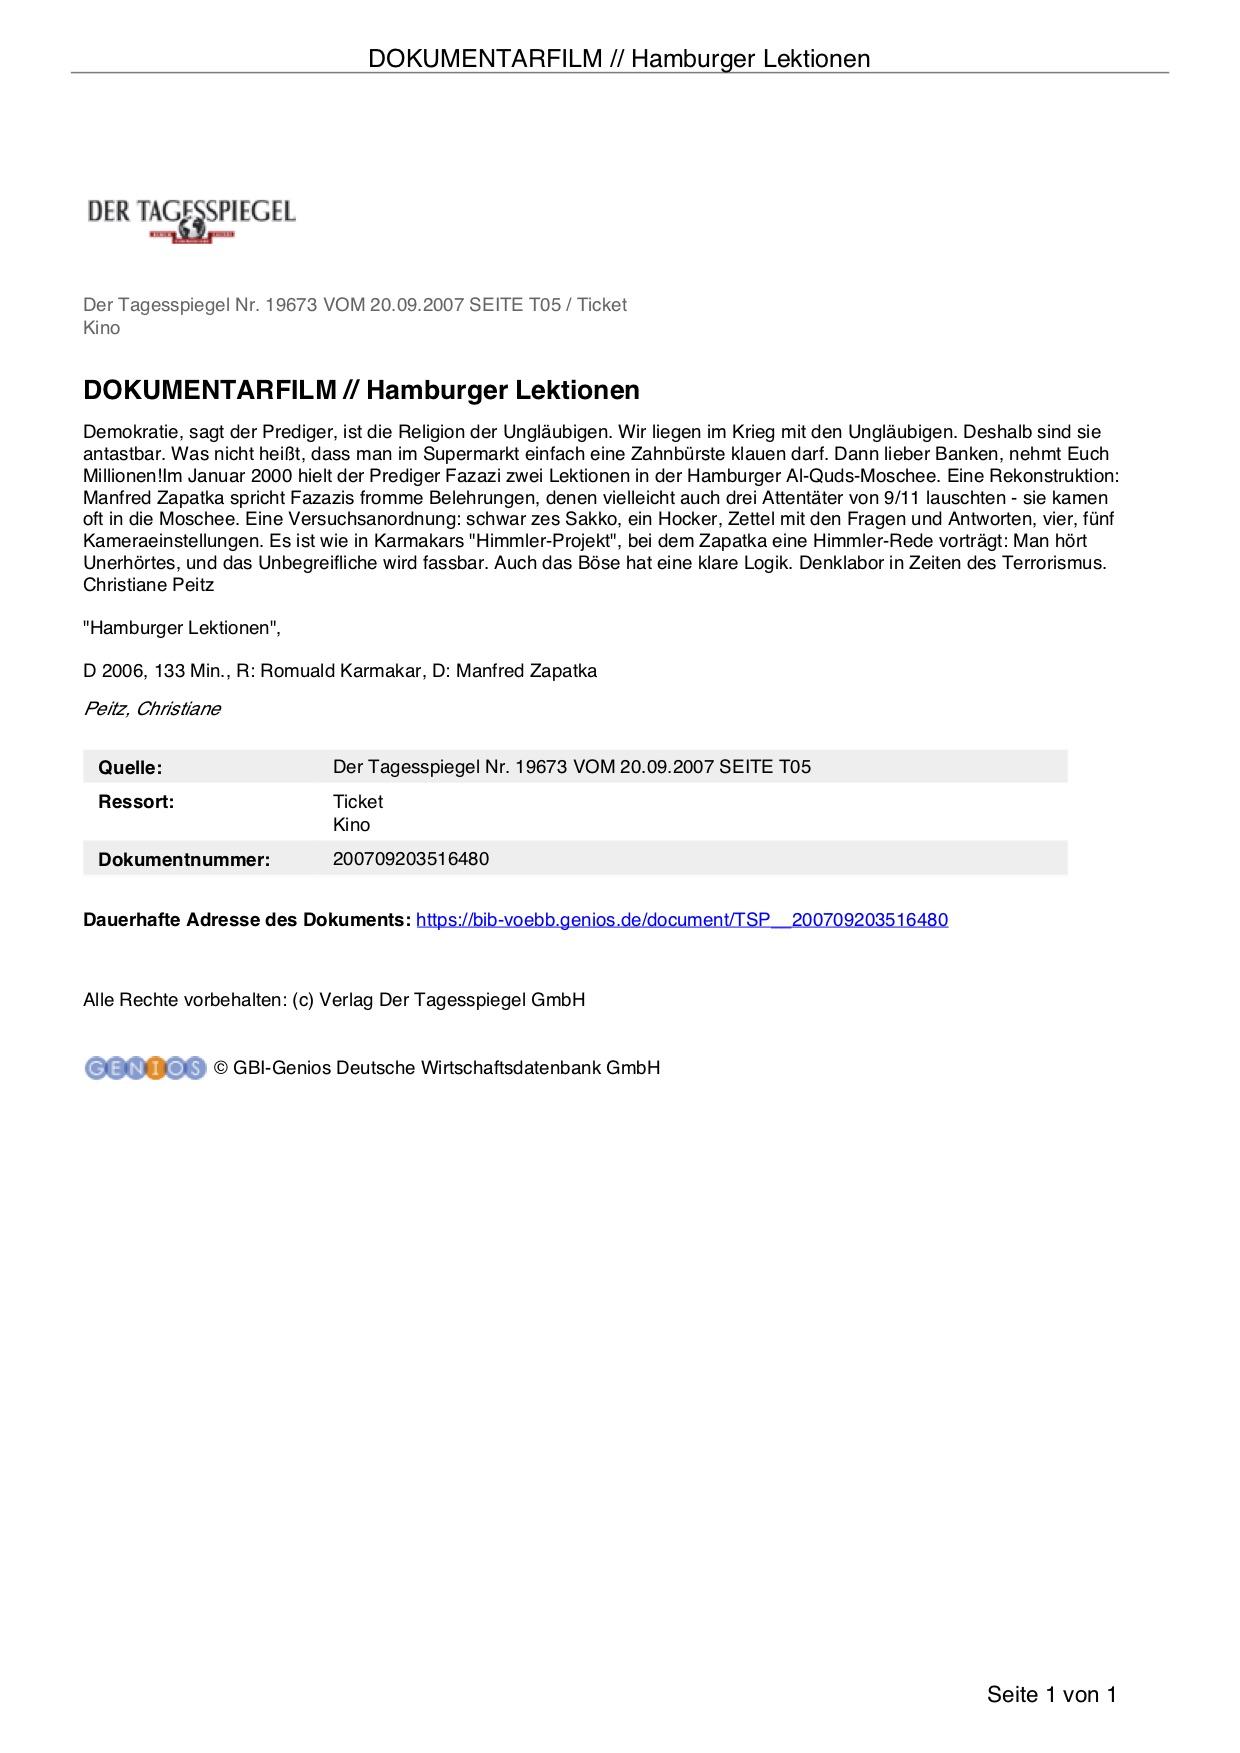 DOKUMENTARFILM // HAMBURGER LEKTIONEN